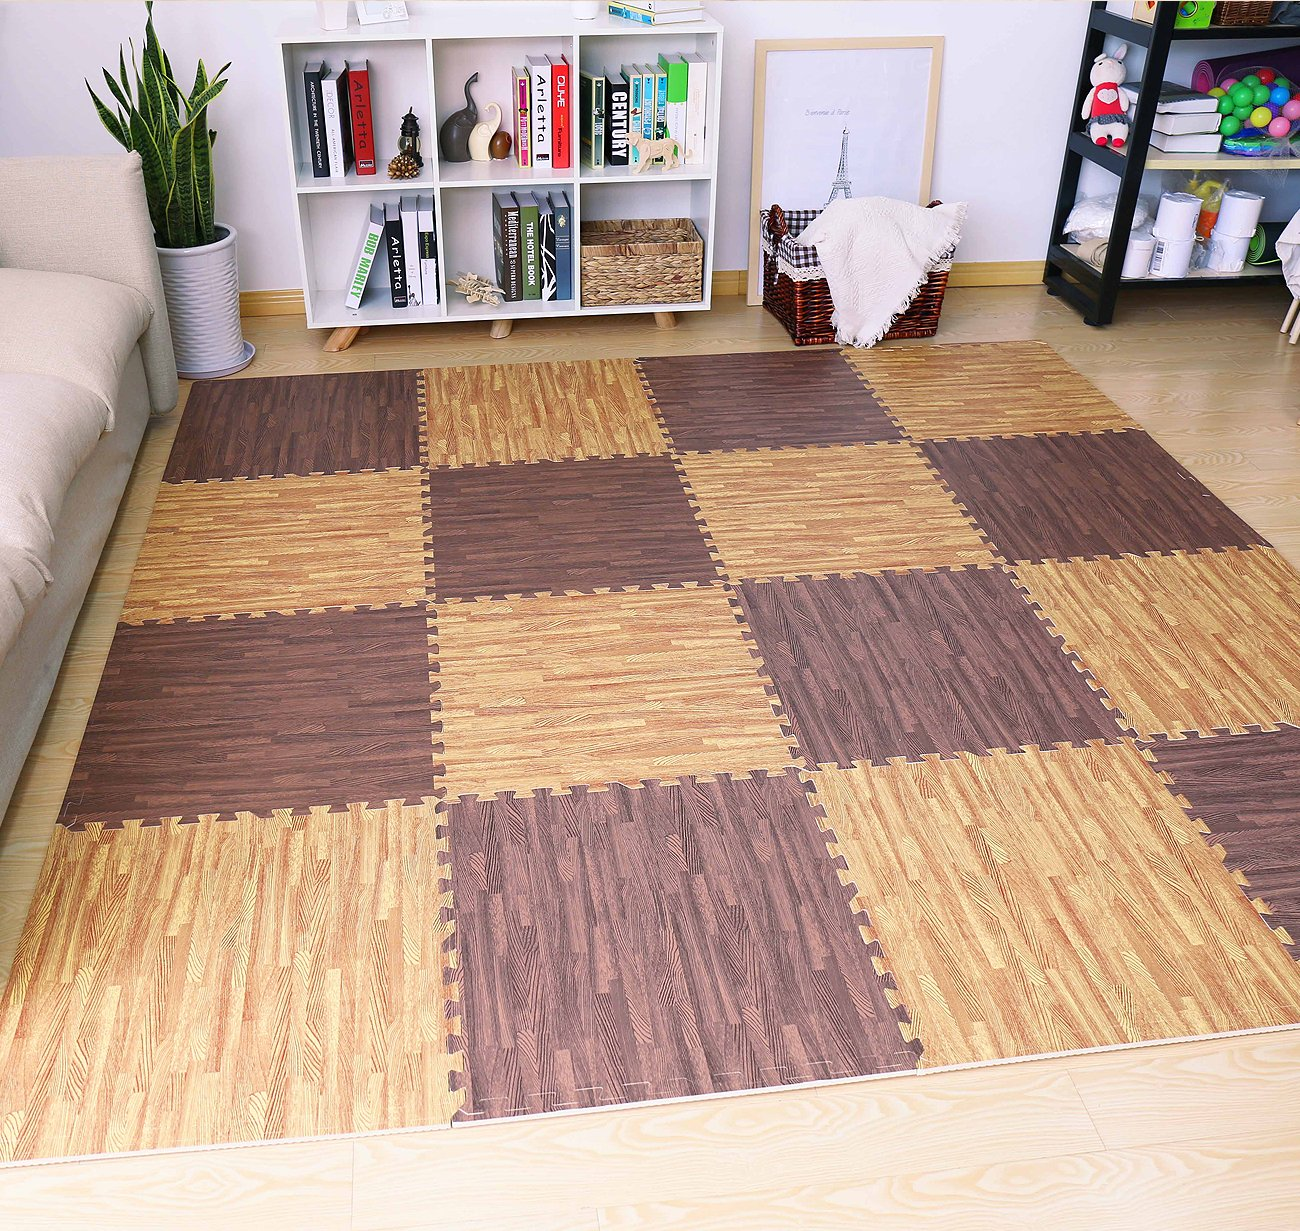 Sorbus Interlocking Floor Mat Print, Wood Grain - Dark (6-Piece) by Sorbus (Image #5)